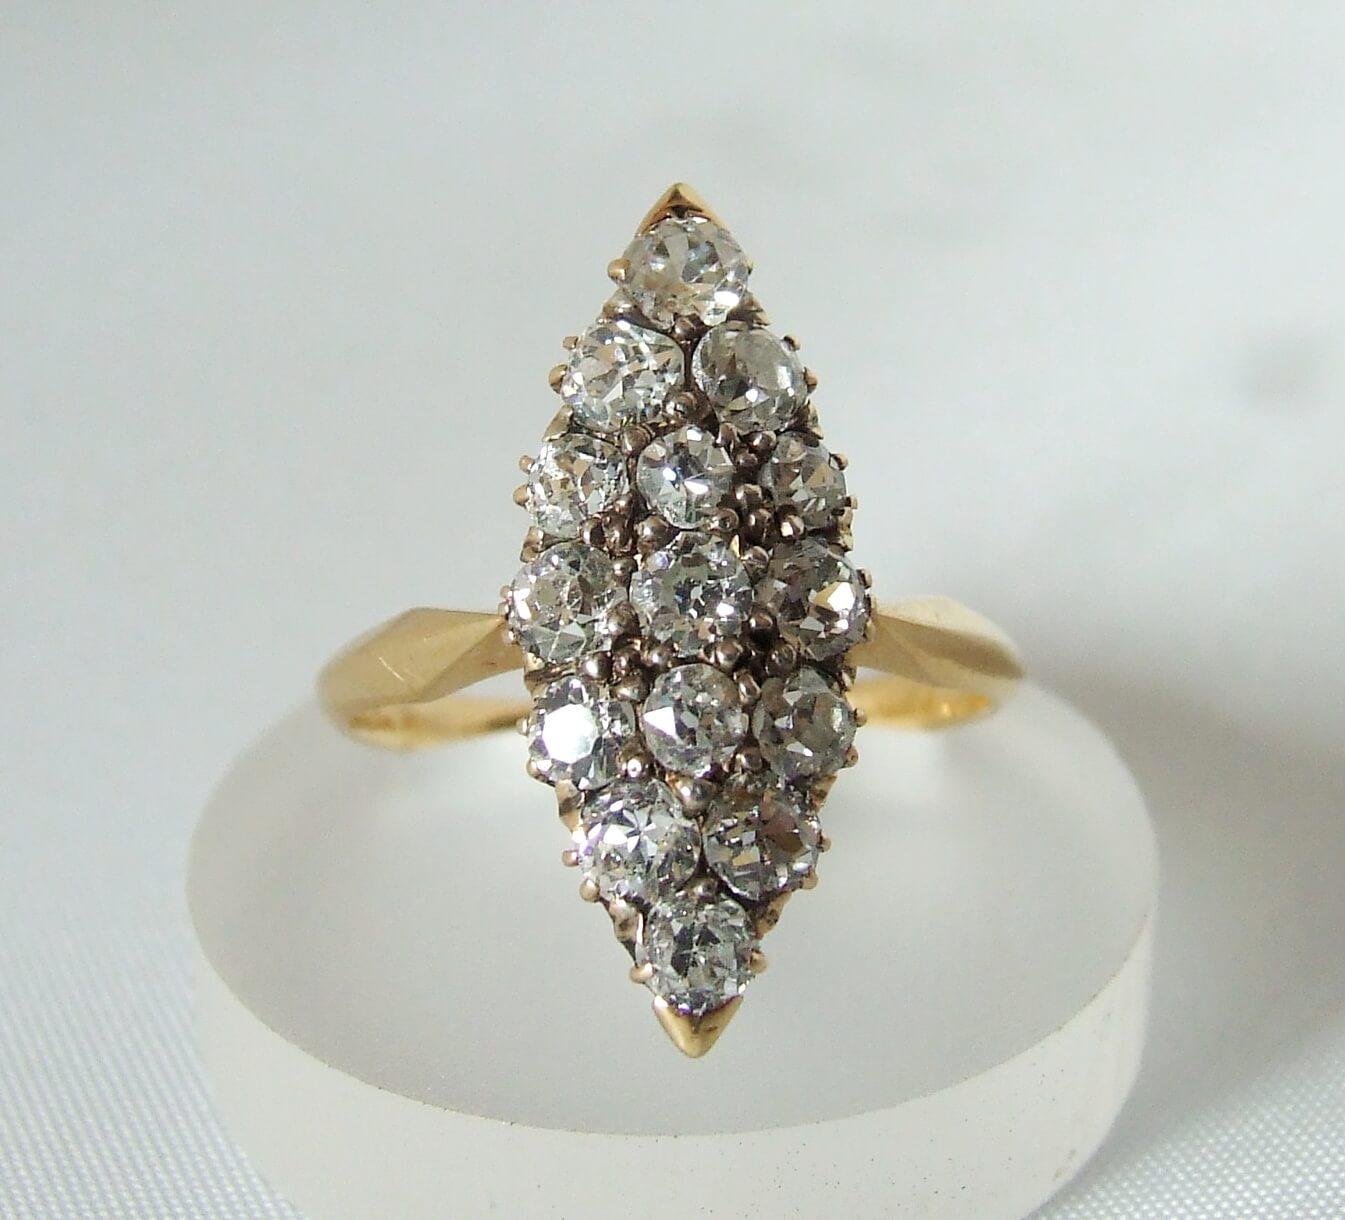 Antieke gouden ring met briljanten kopen? De mooiste ring   Christian